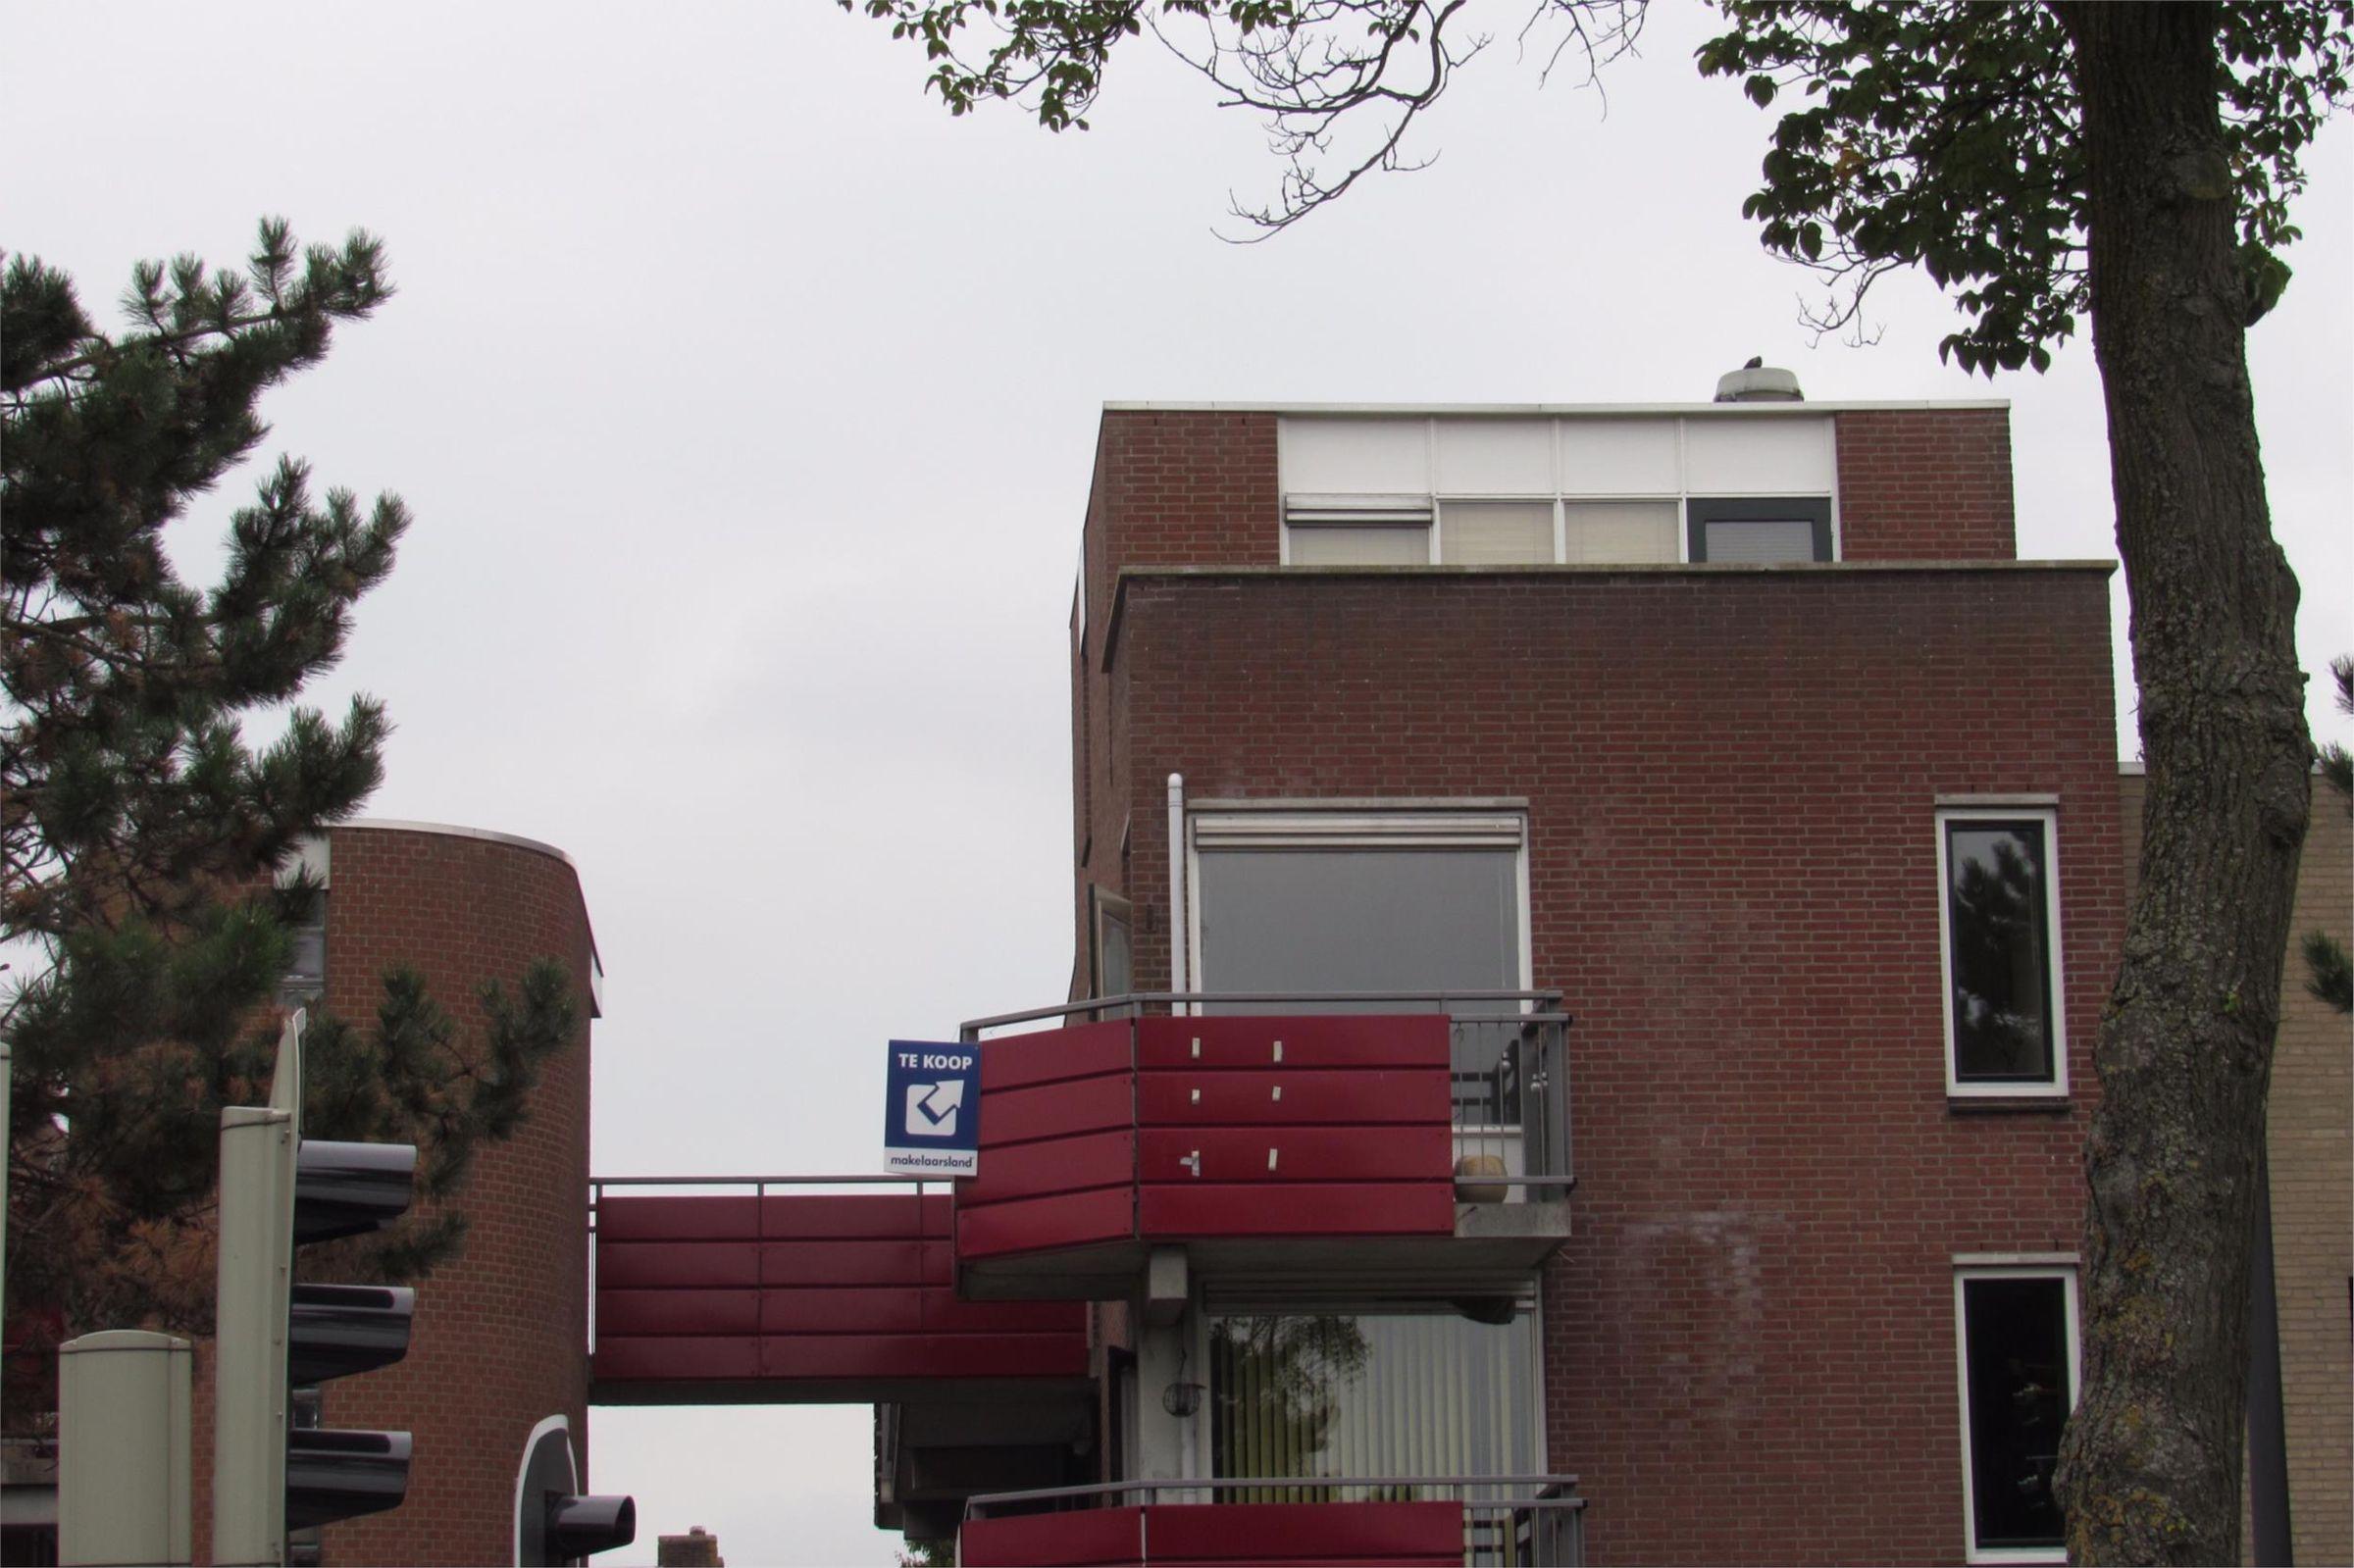 Boeier 37, Maassluis